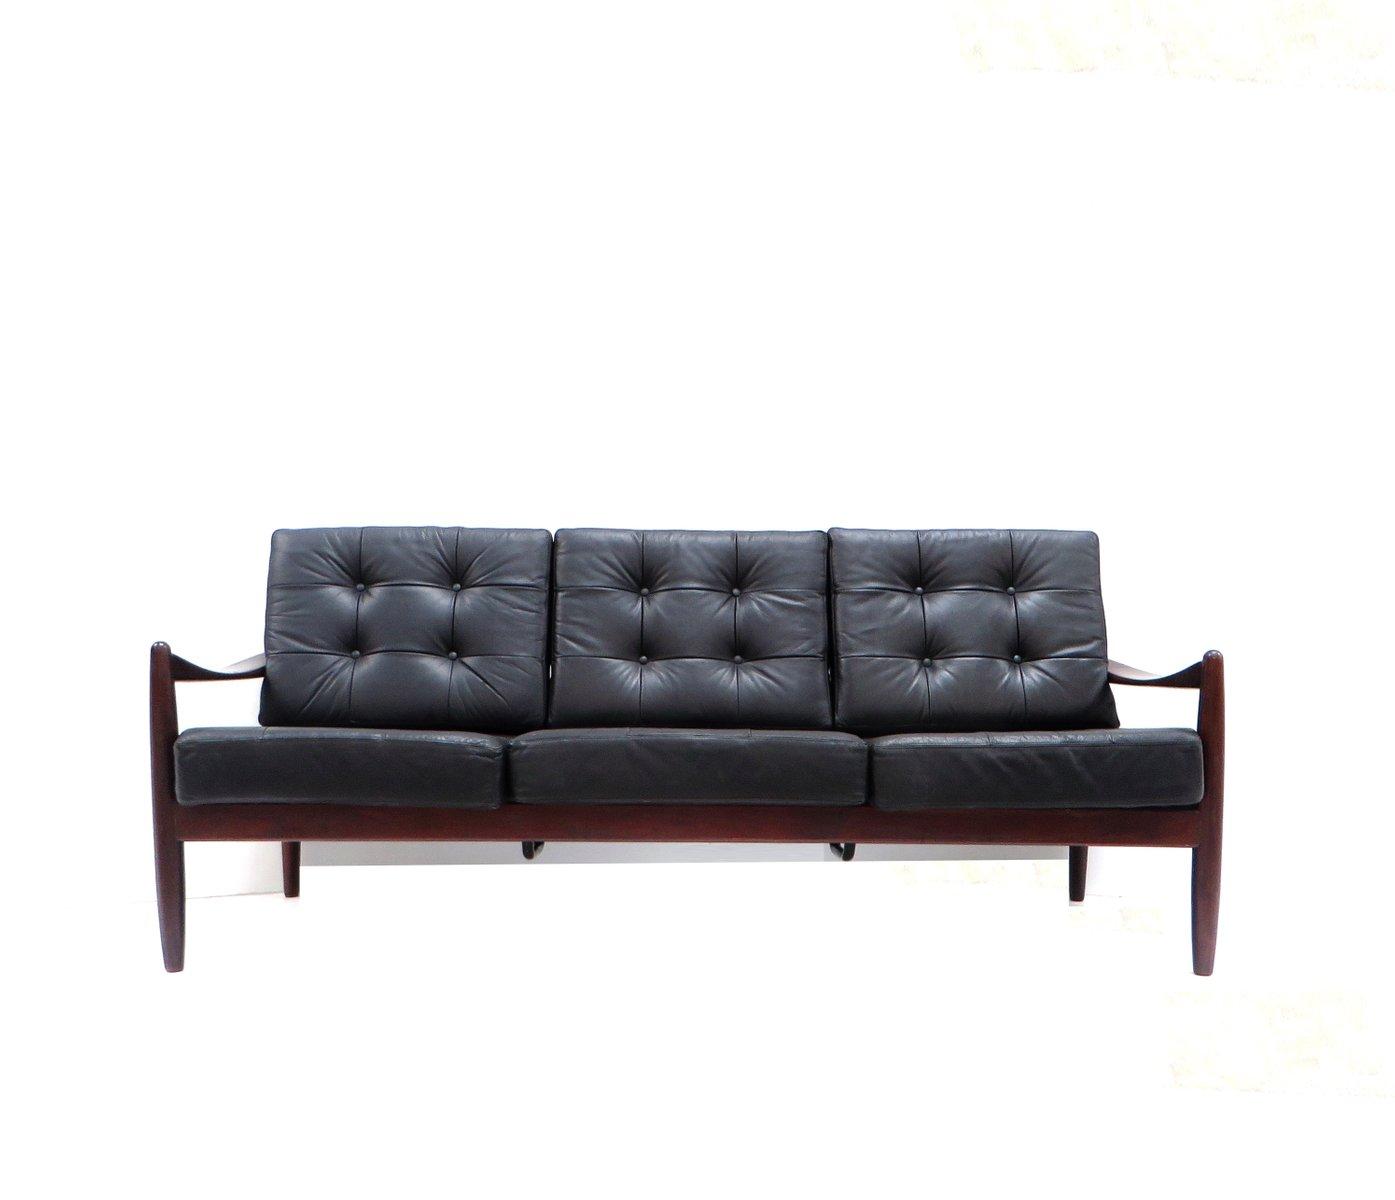 Danish Vintage 3 Seater Leather Sofa